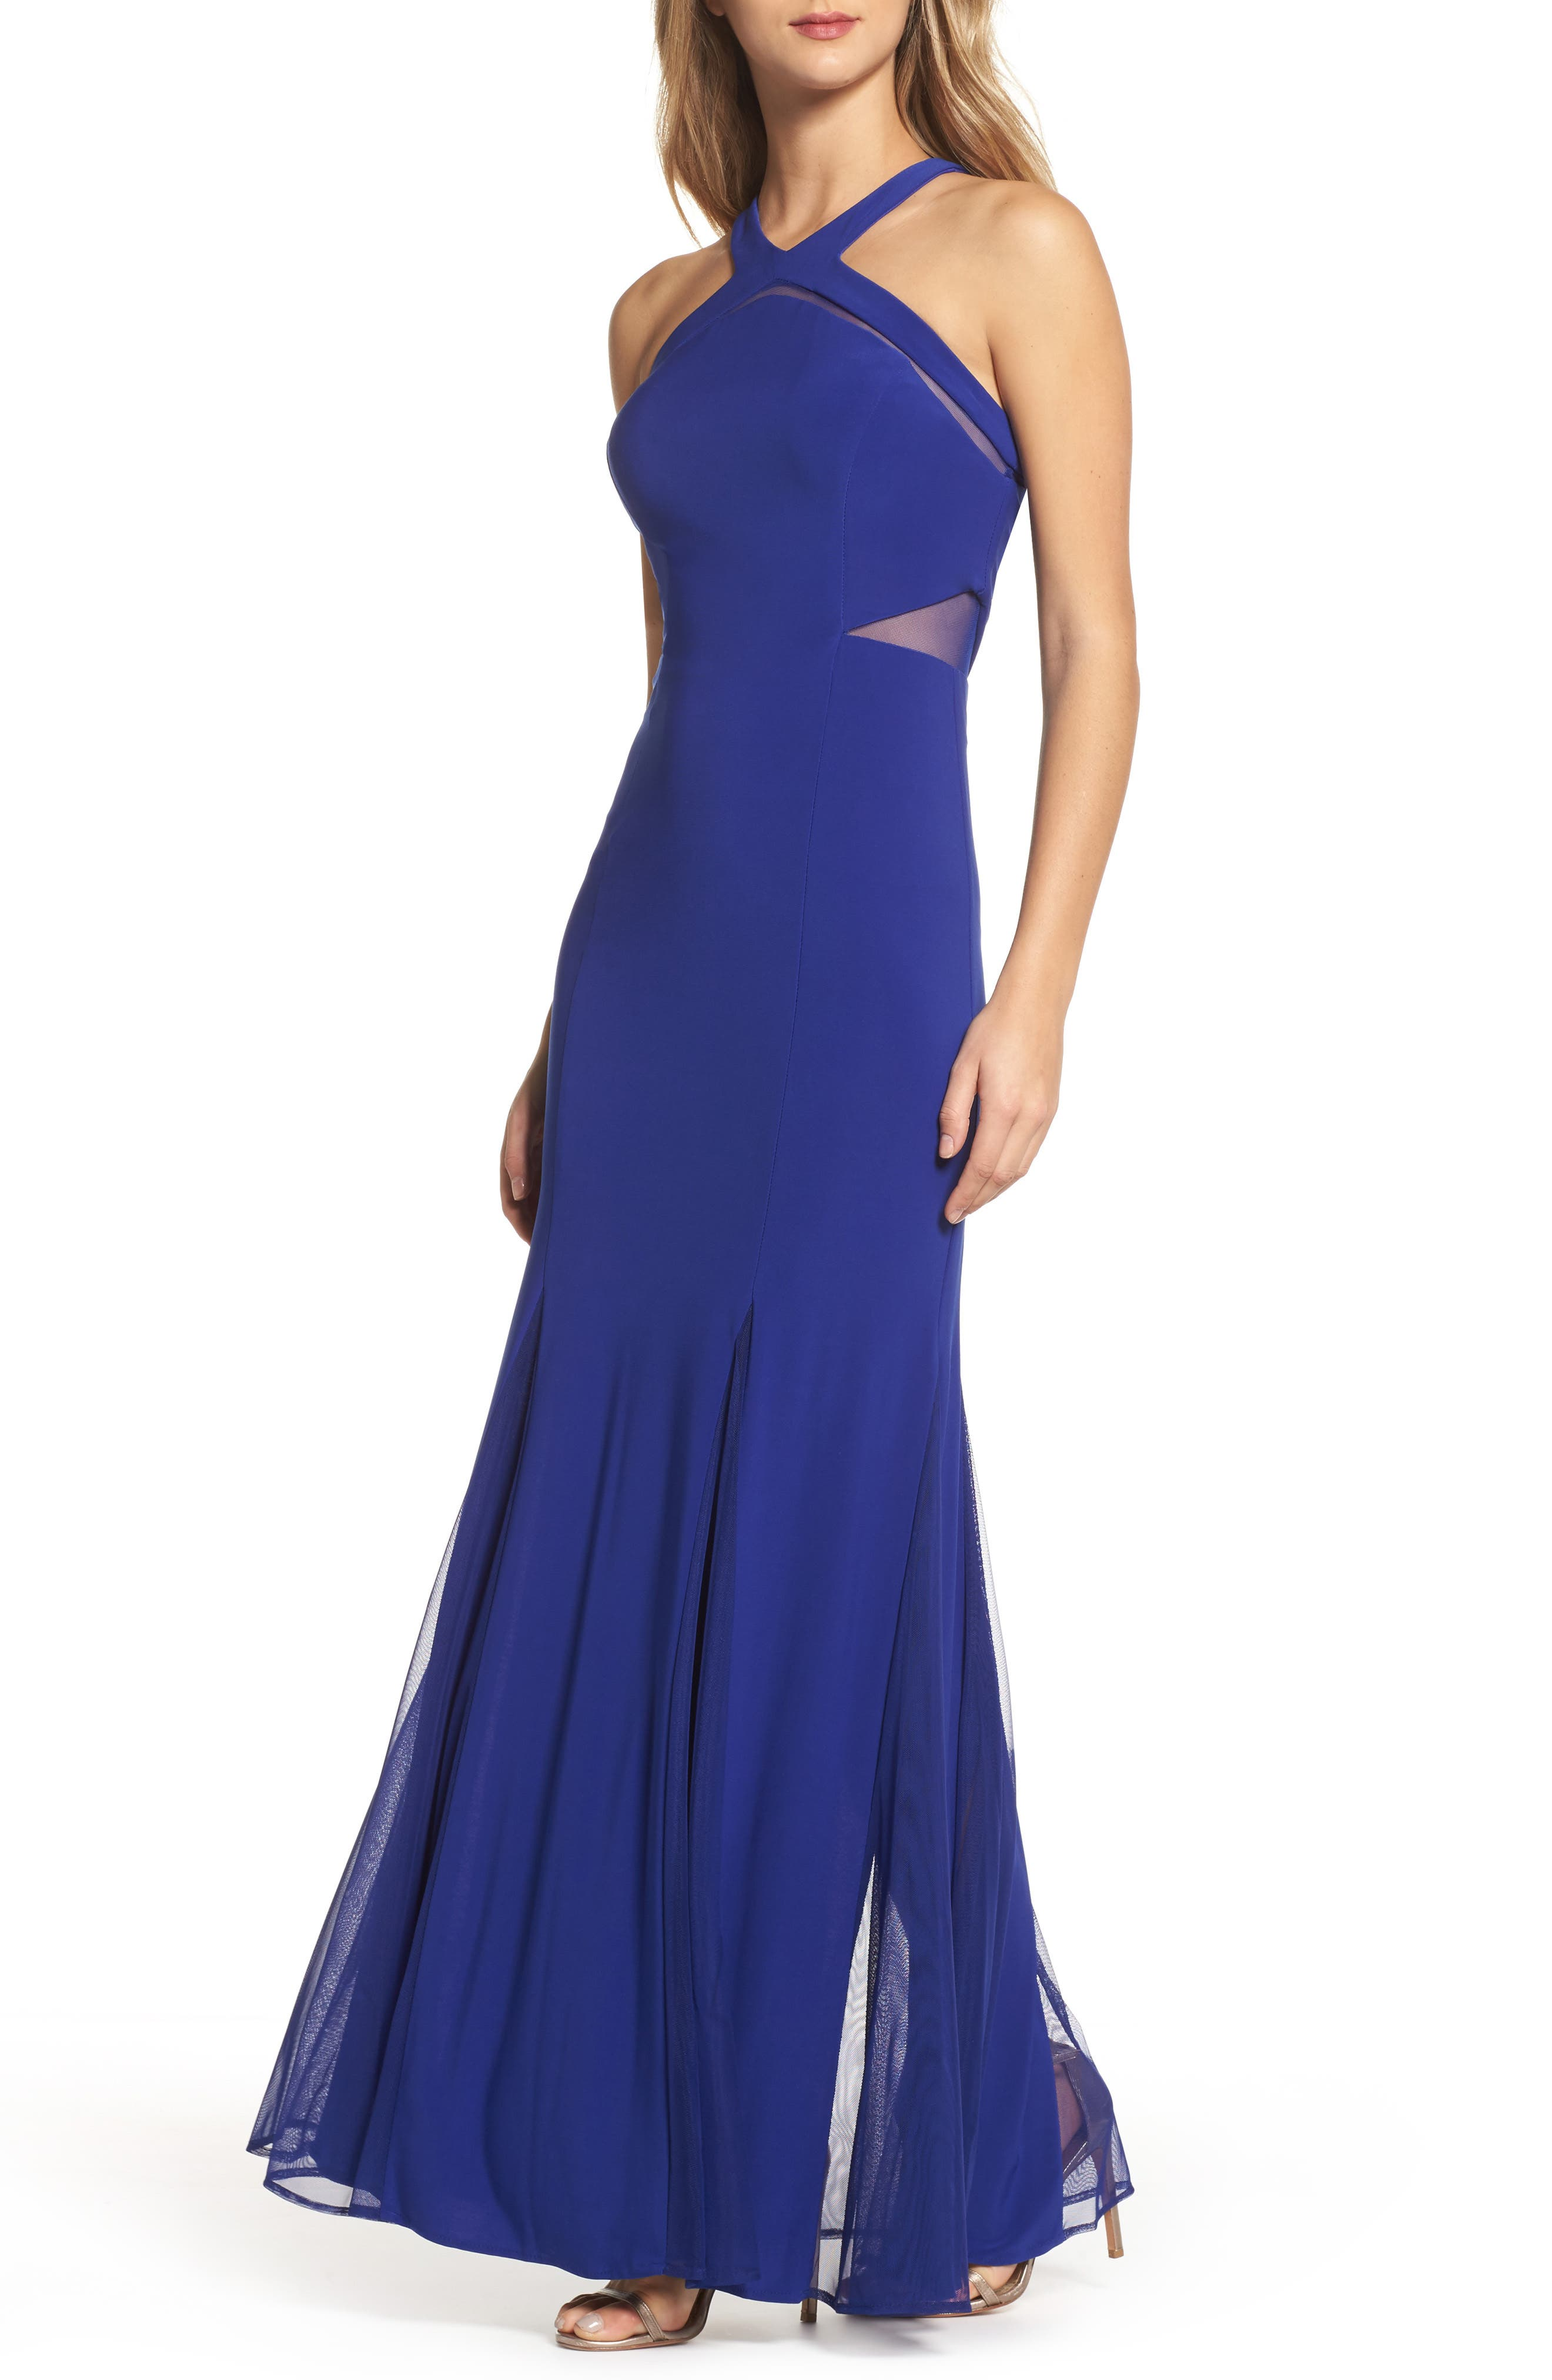 Main Image - Morgan & Co. Mesh Inset Knit Mermaid Gown